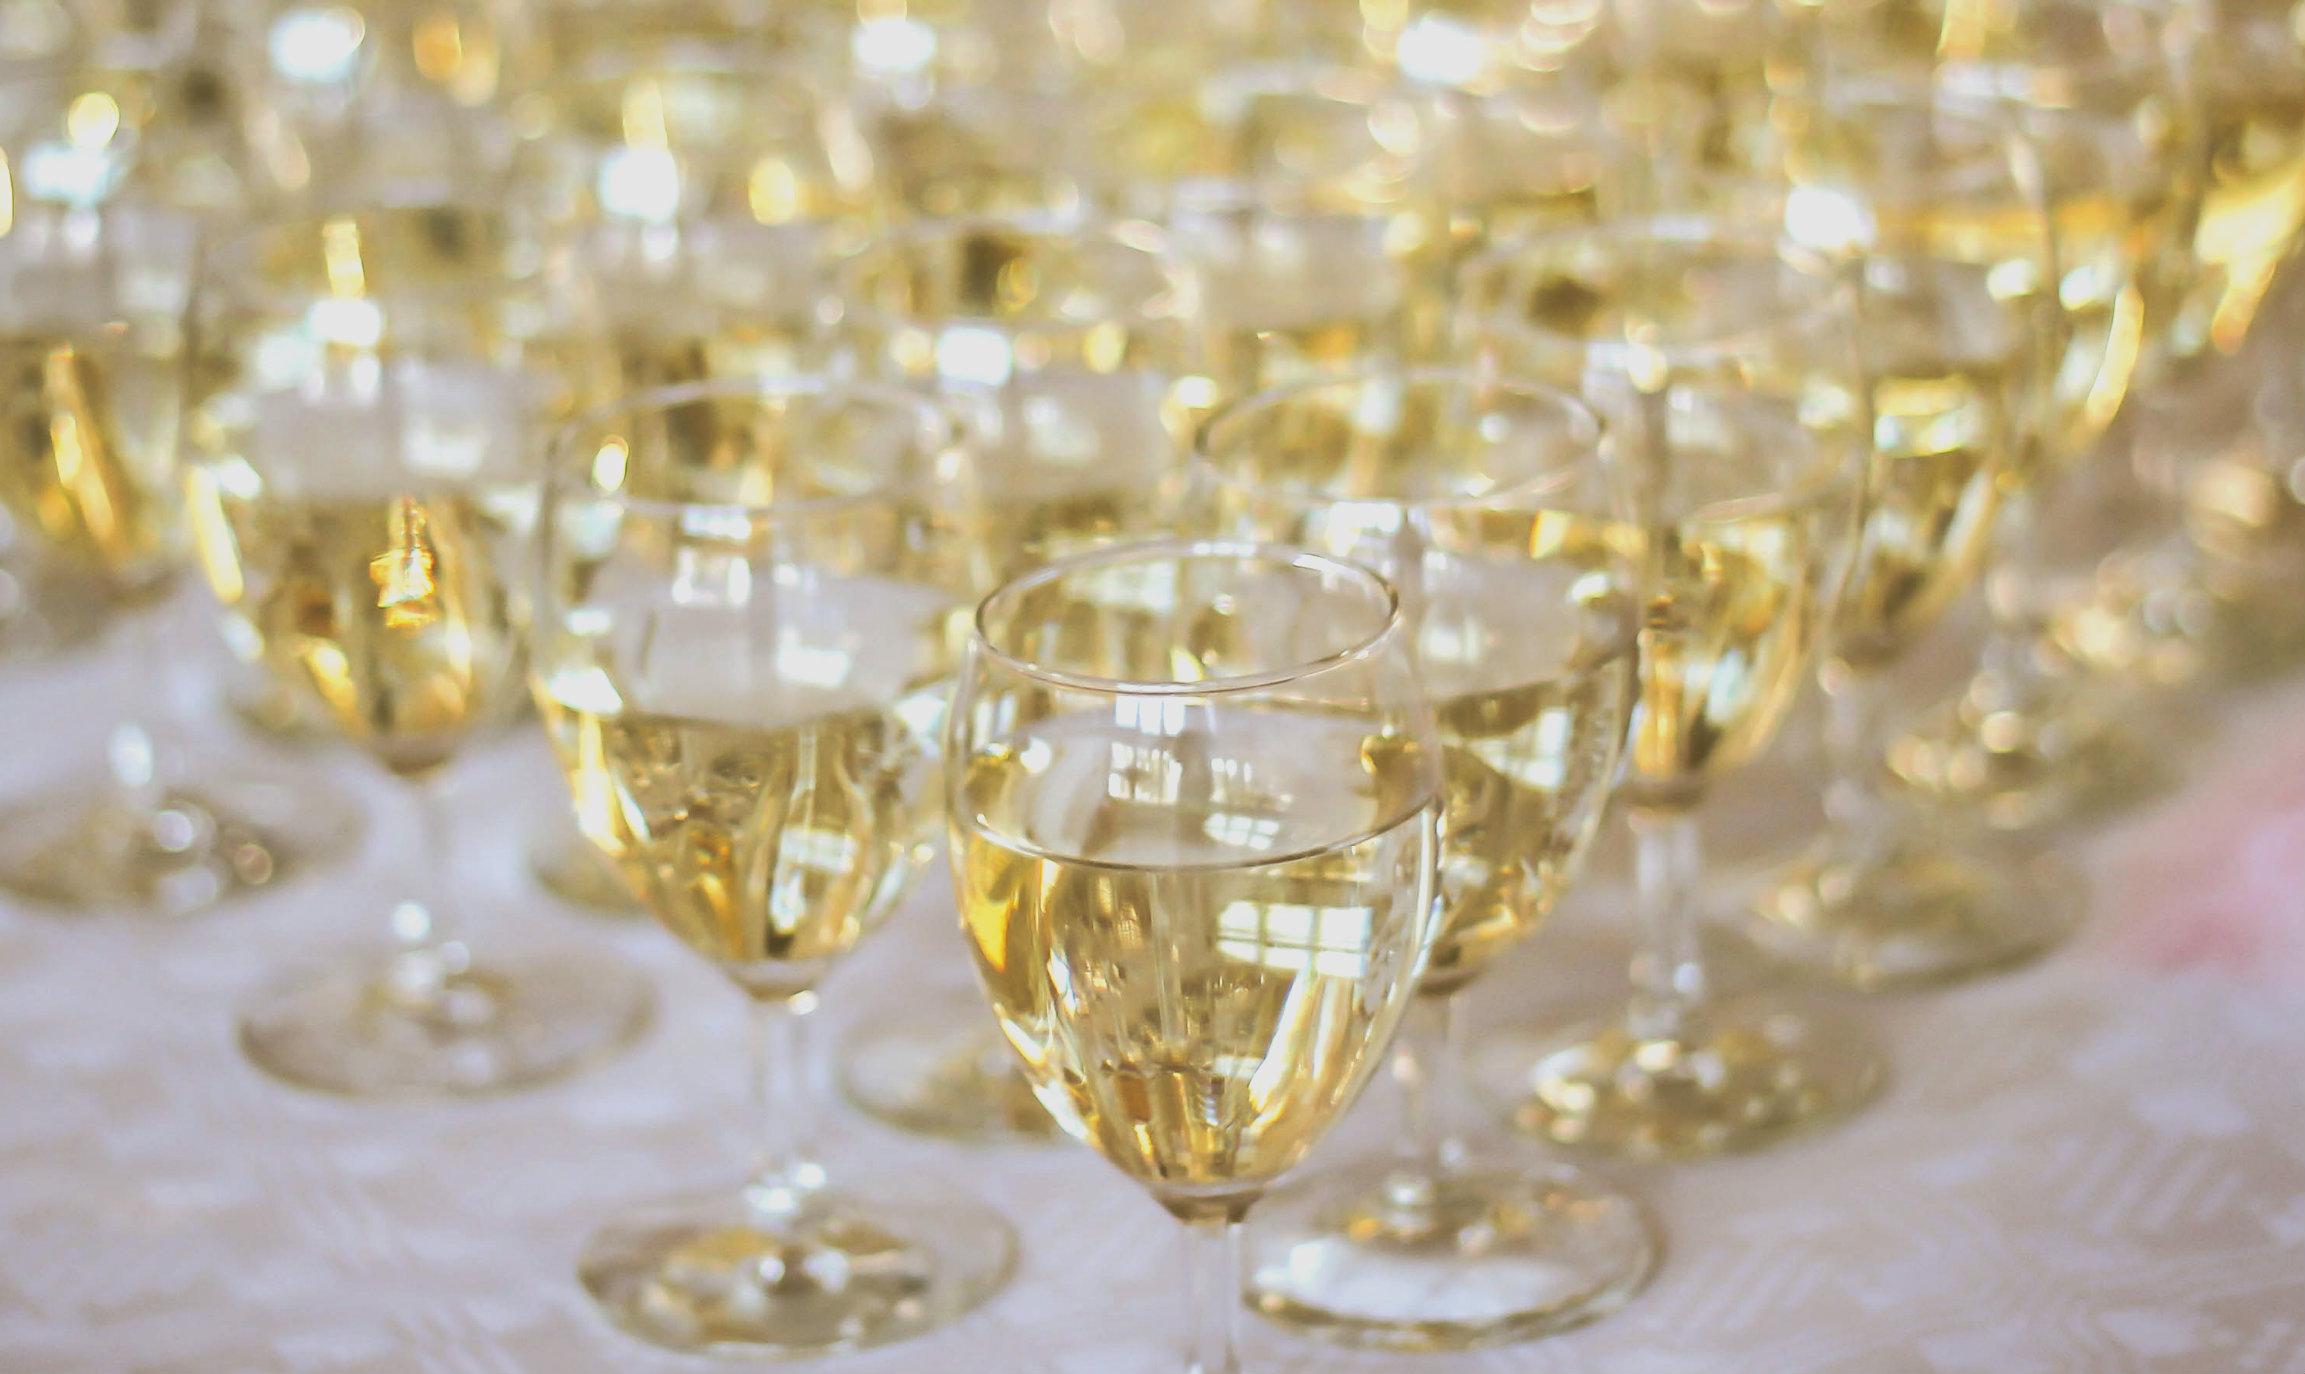 Vin til studentergildet